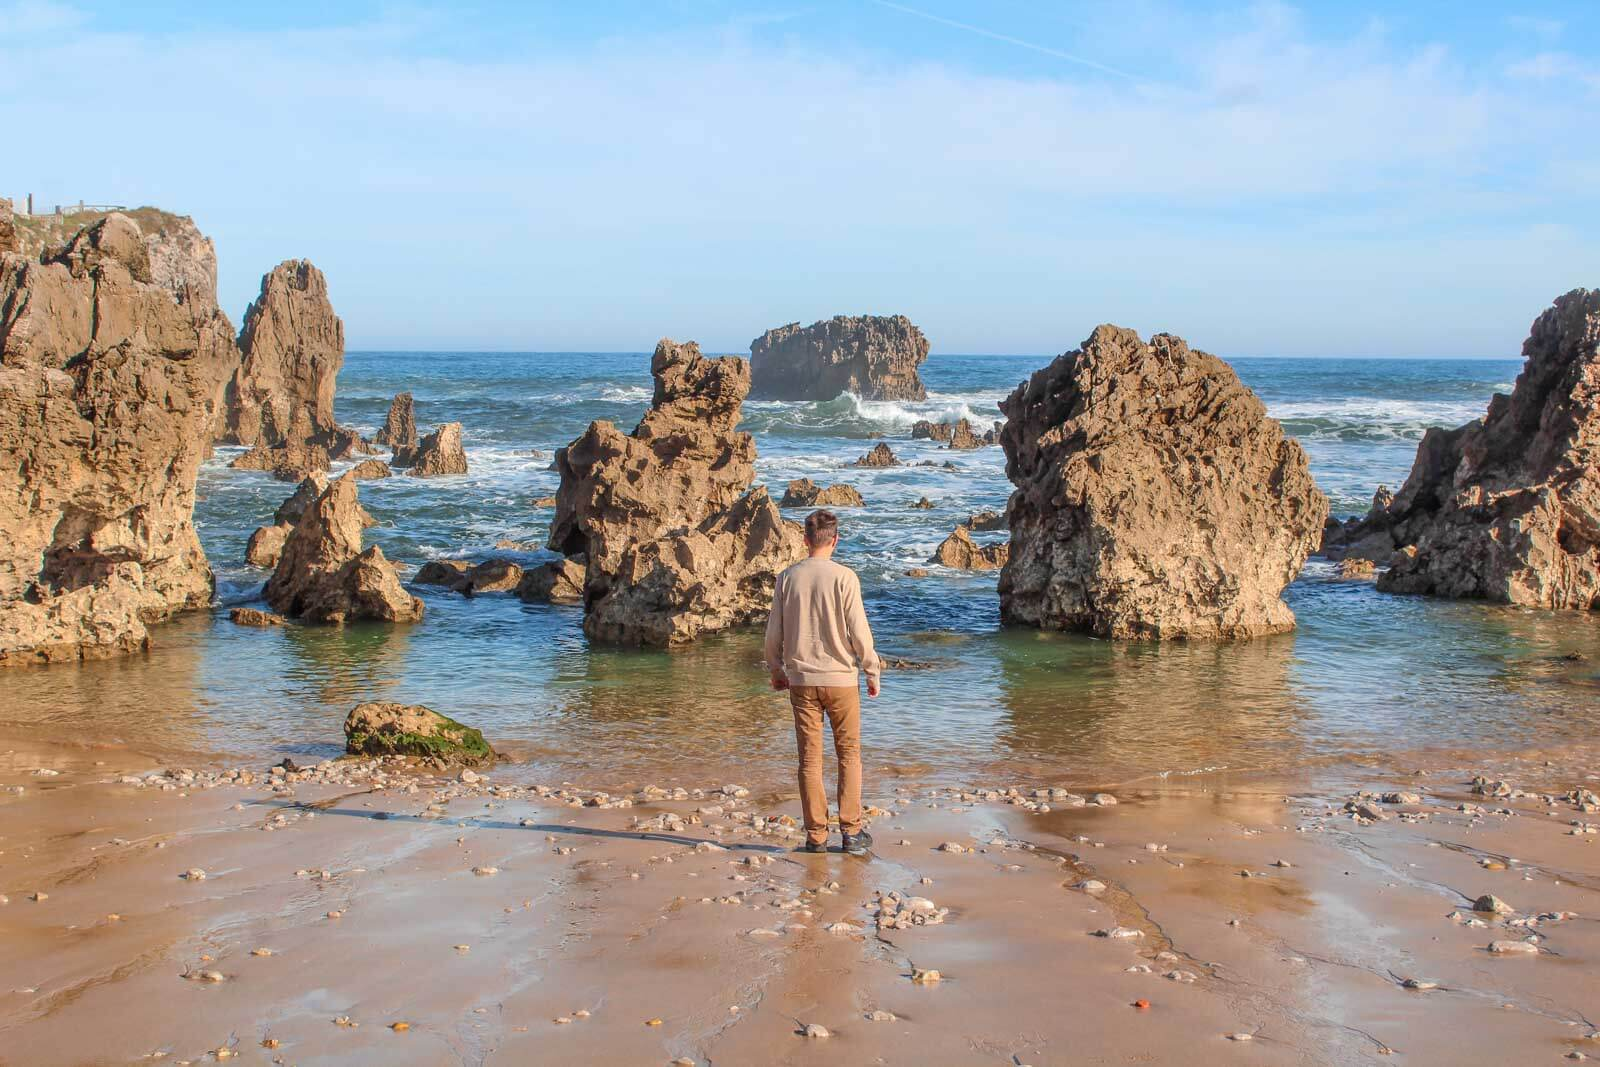 Northern coast of Spain